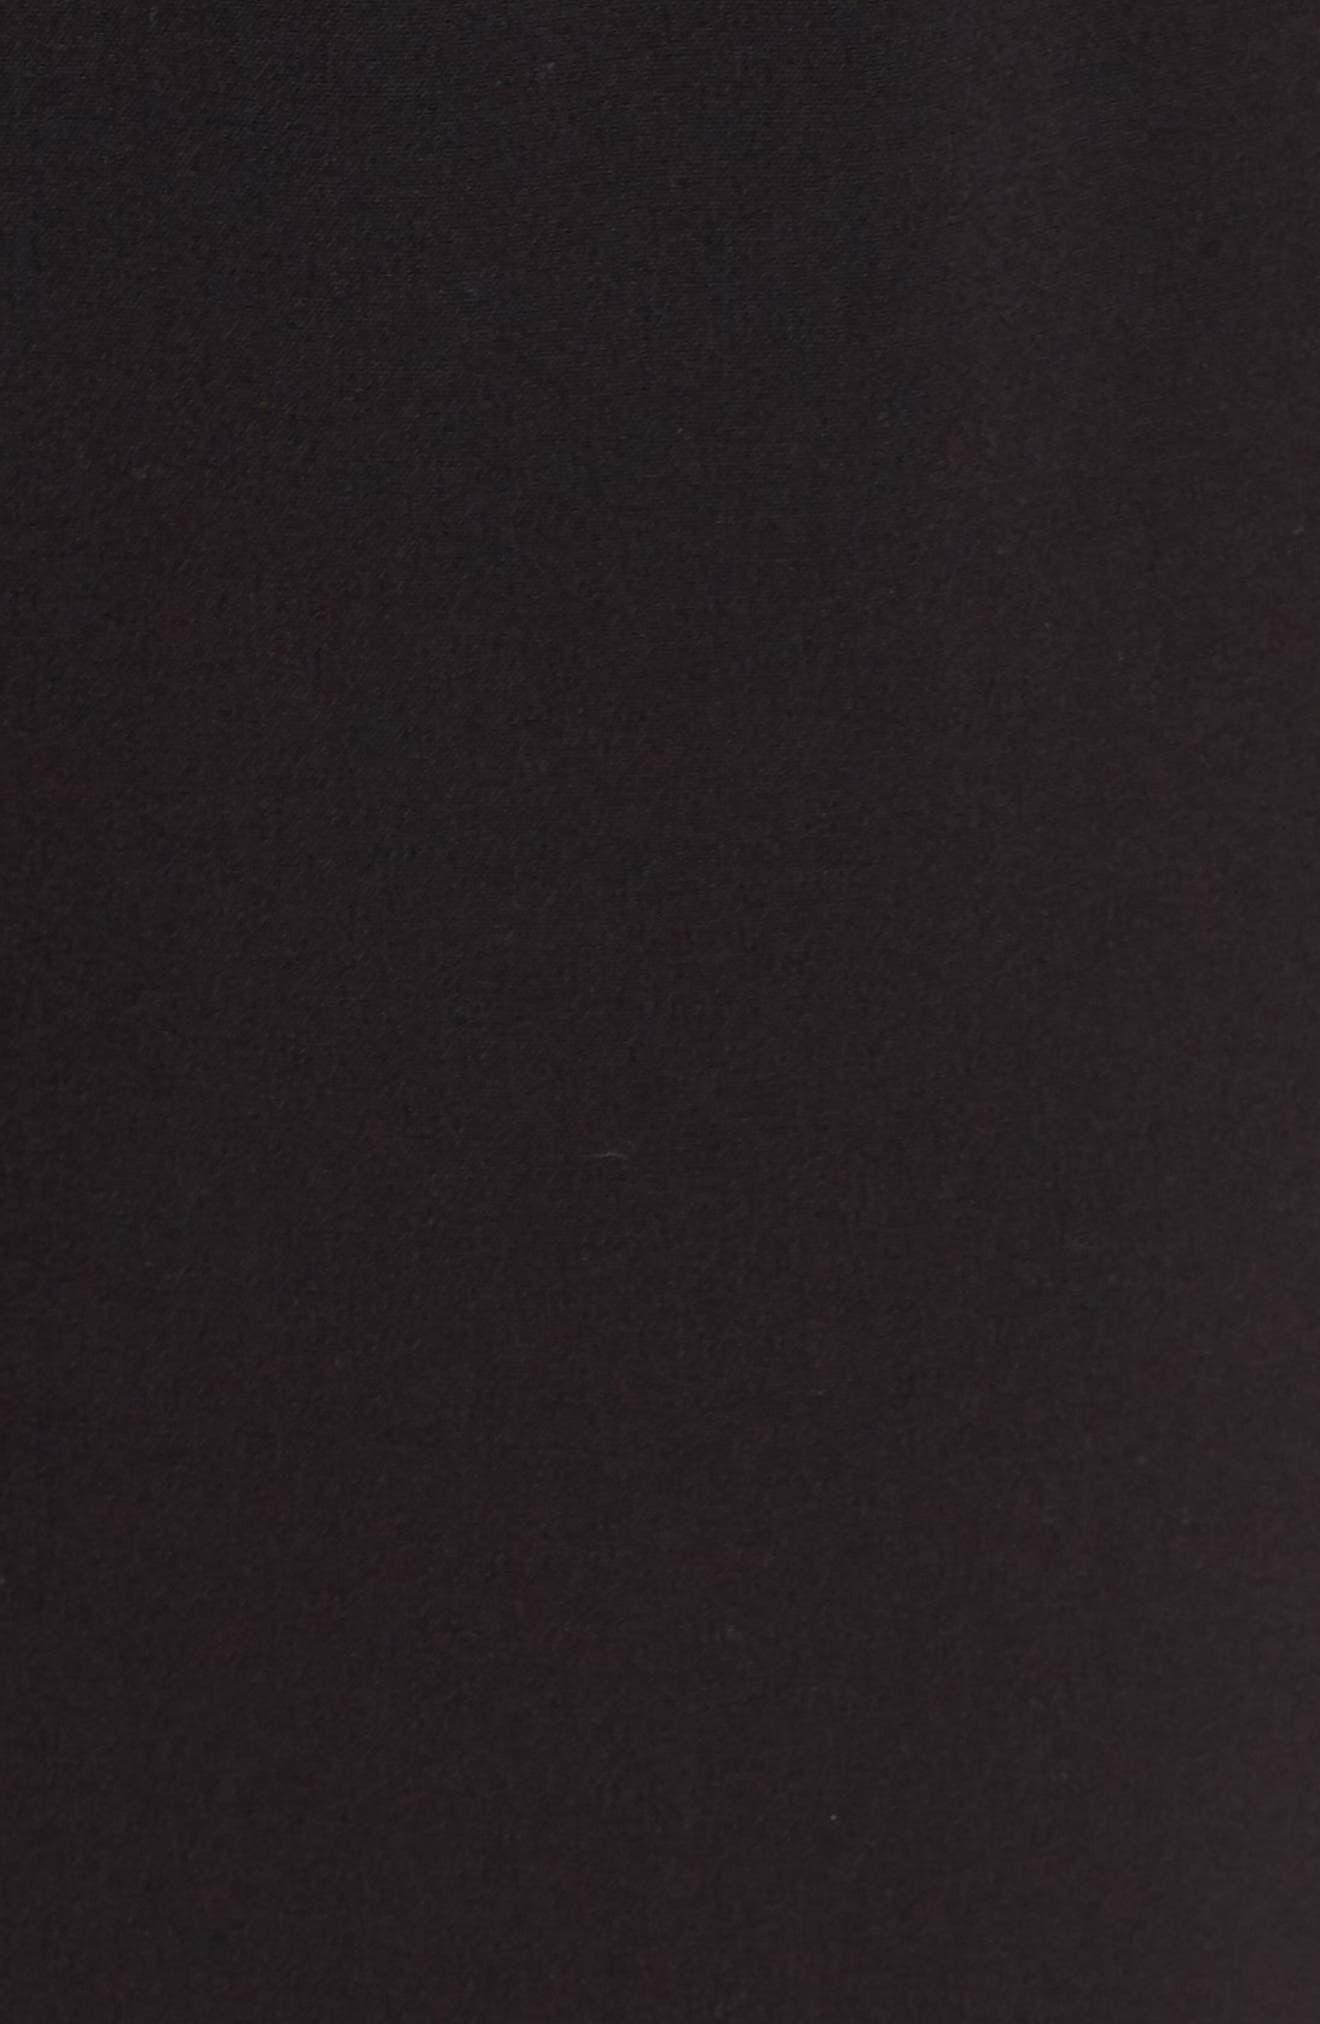 Stretch Peplum Waist Jumpsuit,                             Alternate thumbnail 6, color,                             BLACK